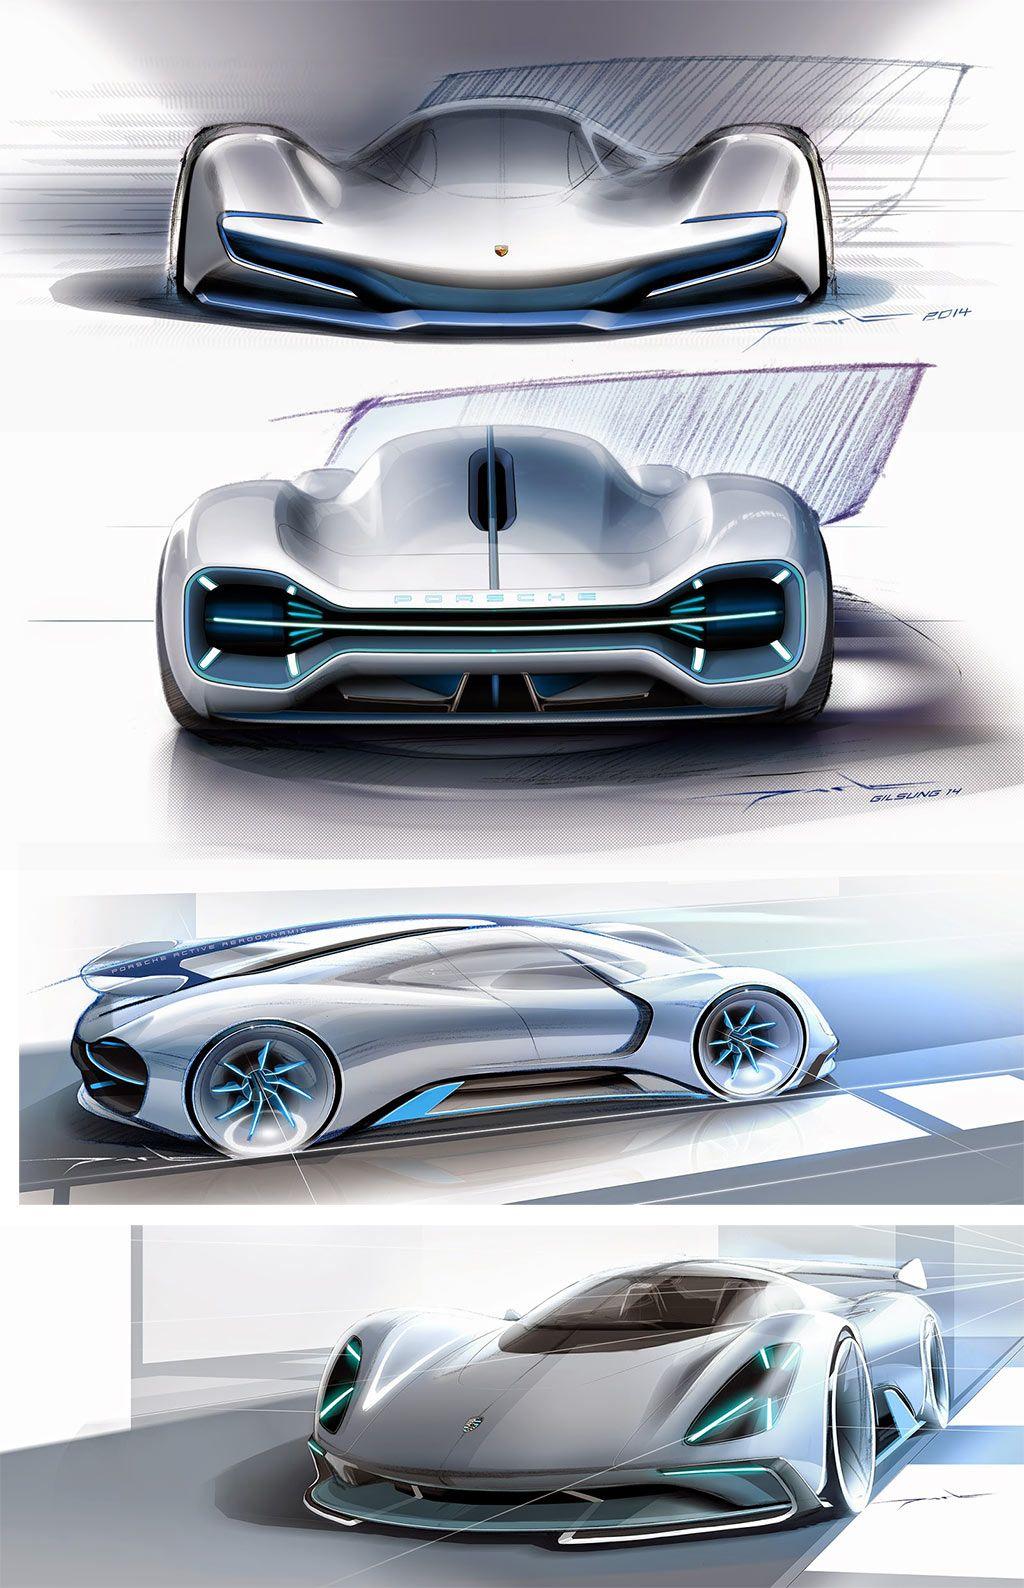 Porsche electric le mans 2035 concept design sketches by - Porche diseno ...